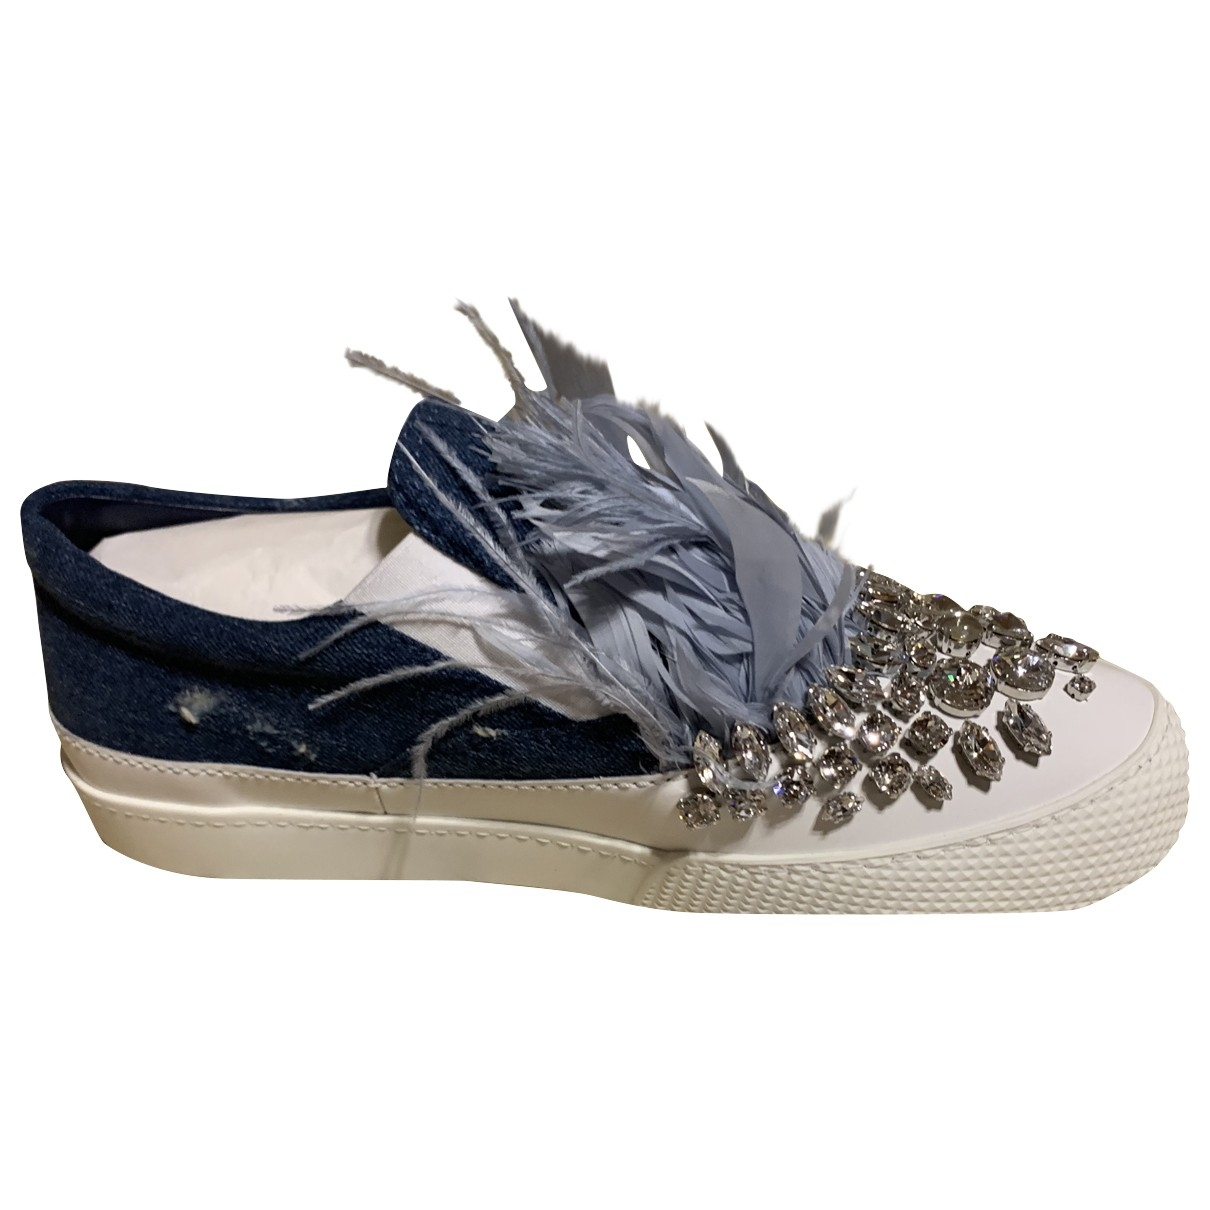 Miu Miu \N Sneakers in  Bunt Mit Pailletten